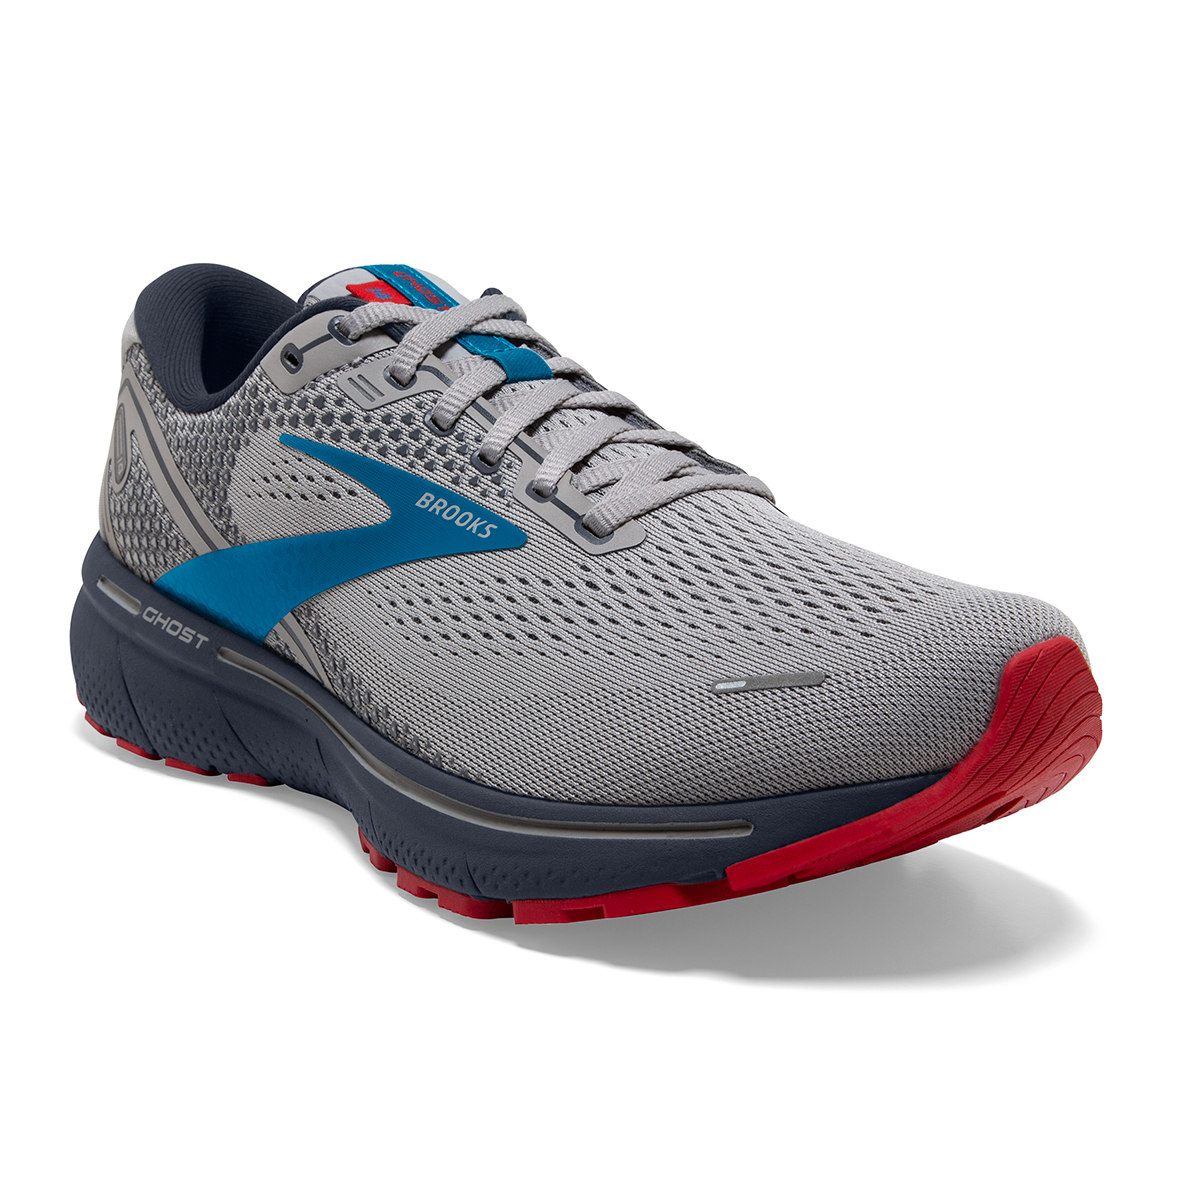 Men's Brooks Ghost 14 Running Shoe - Color: Grey/Blue/Red - Size: 7 - Width: Regular, Grey/Blue/Red, large, image 5